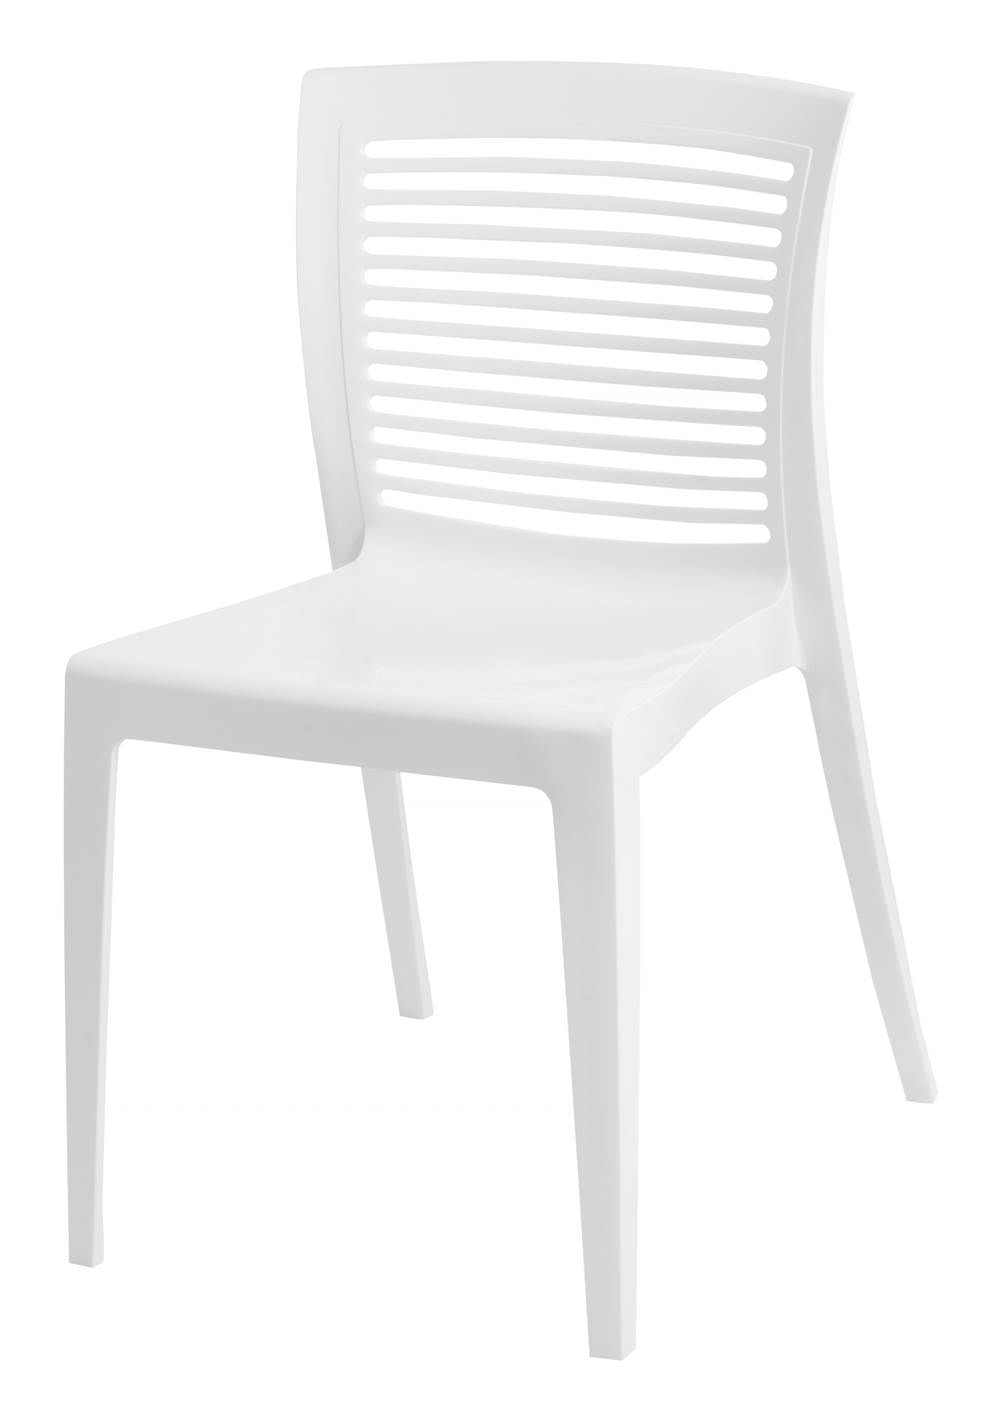 Cadeira Victoria Encosto Vazado Cor Branco - 21712